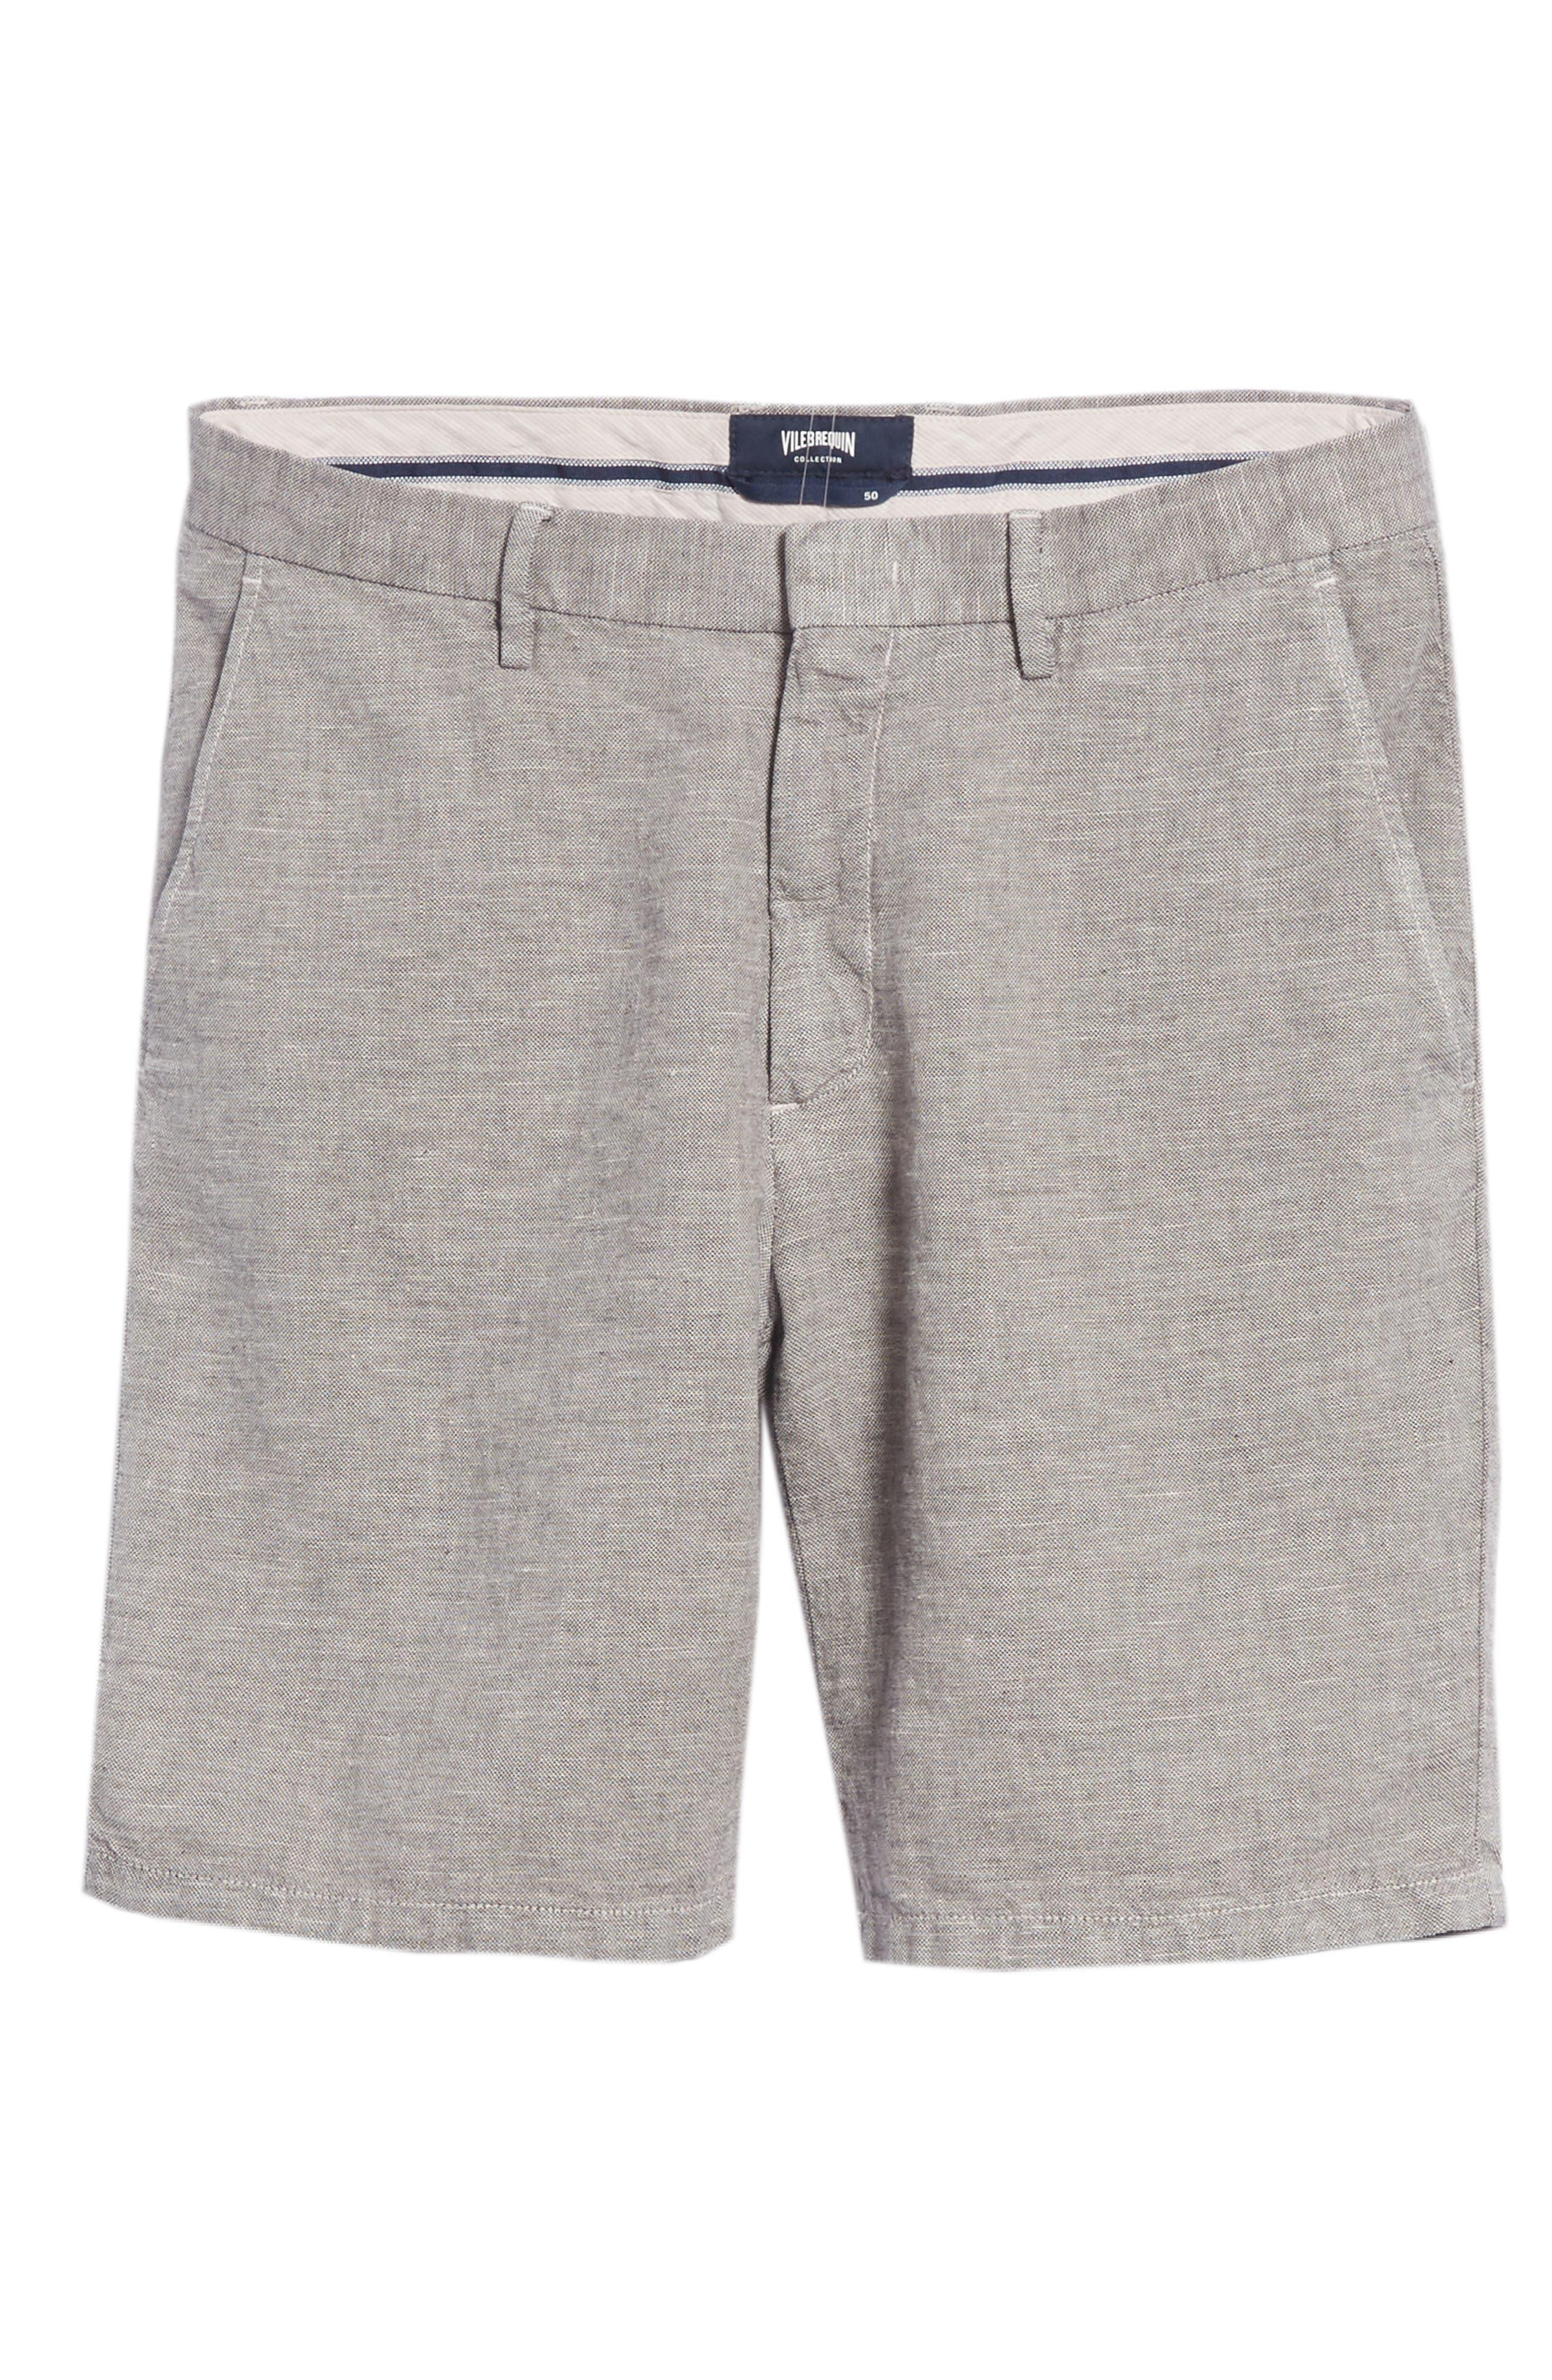 Panama Linen & Cotton Chino Shorts,                             Alternate thumbnail 6, color,                             LIMESTONE